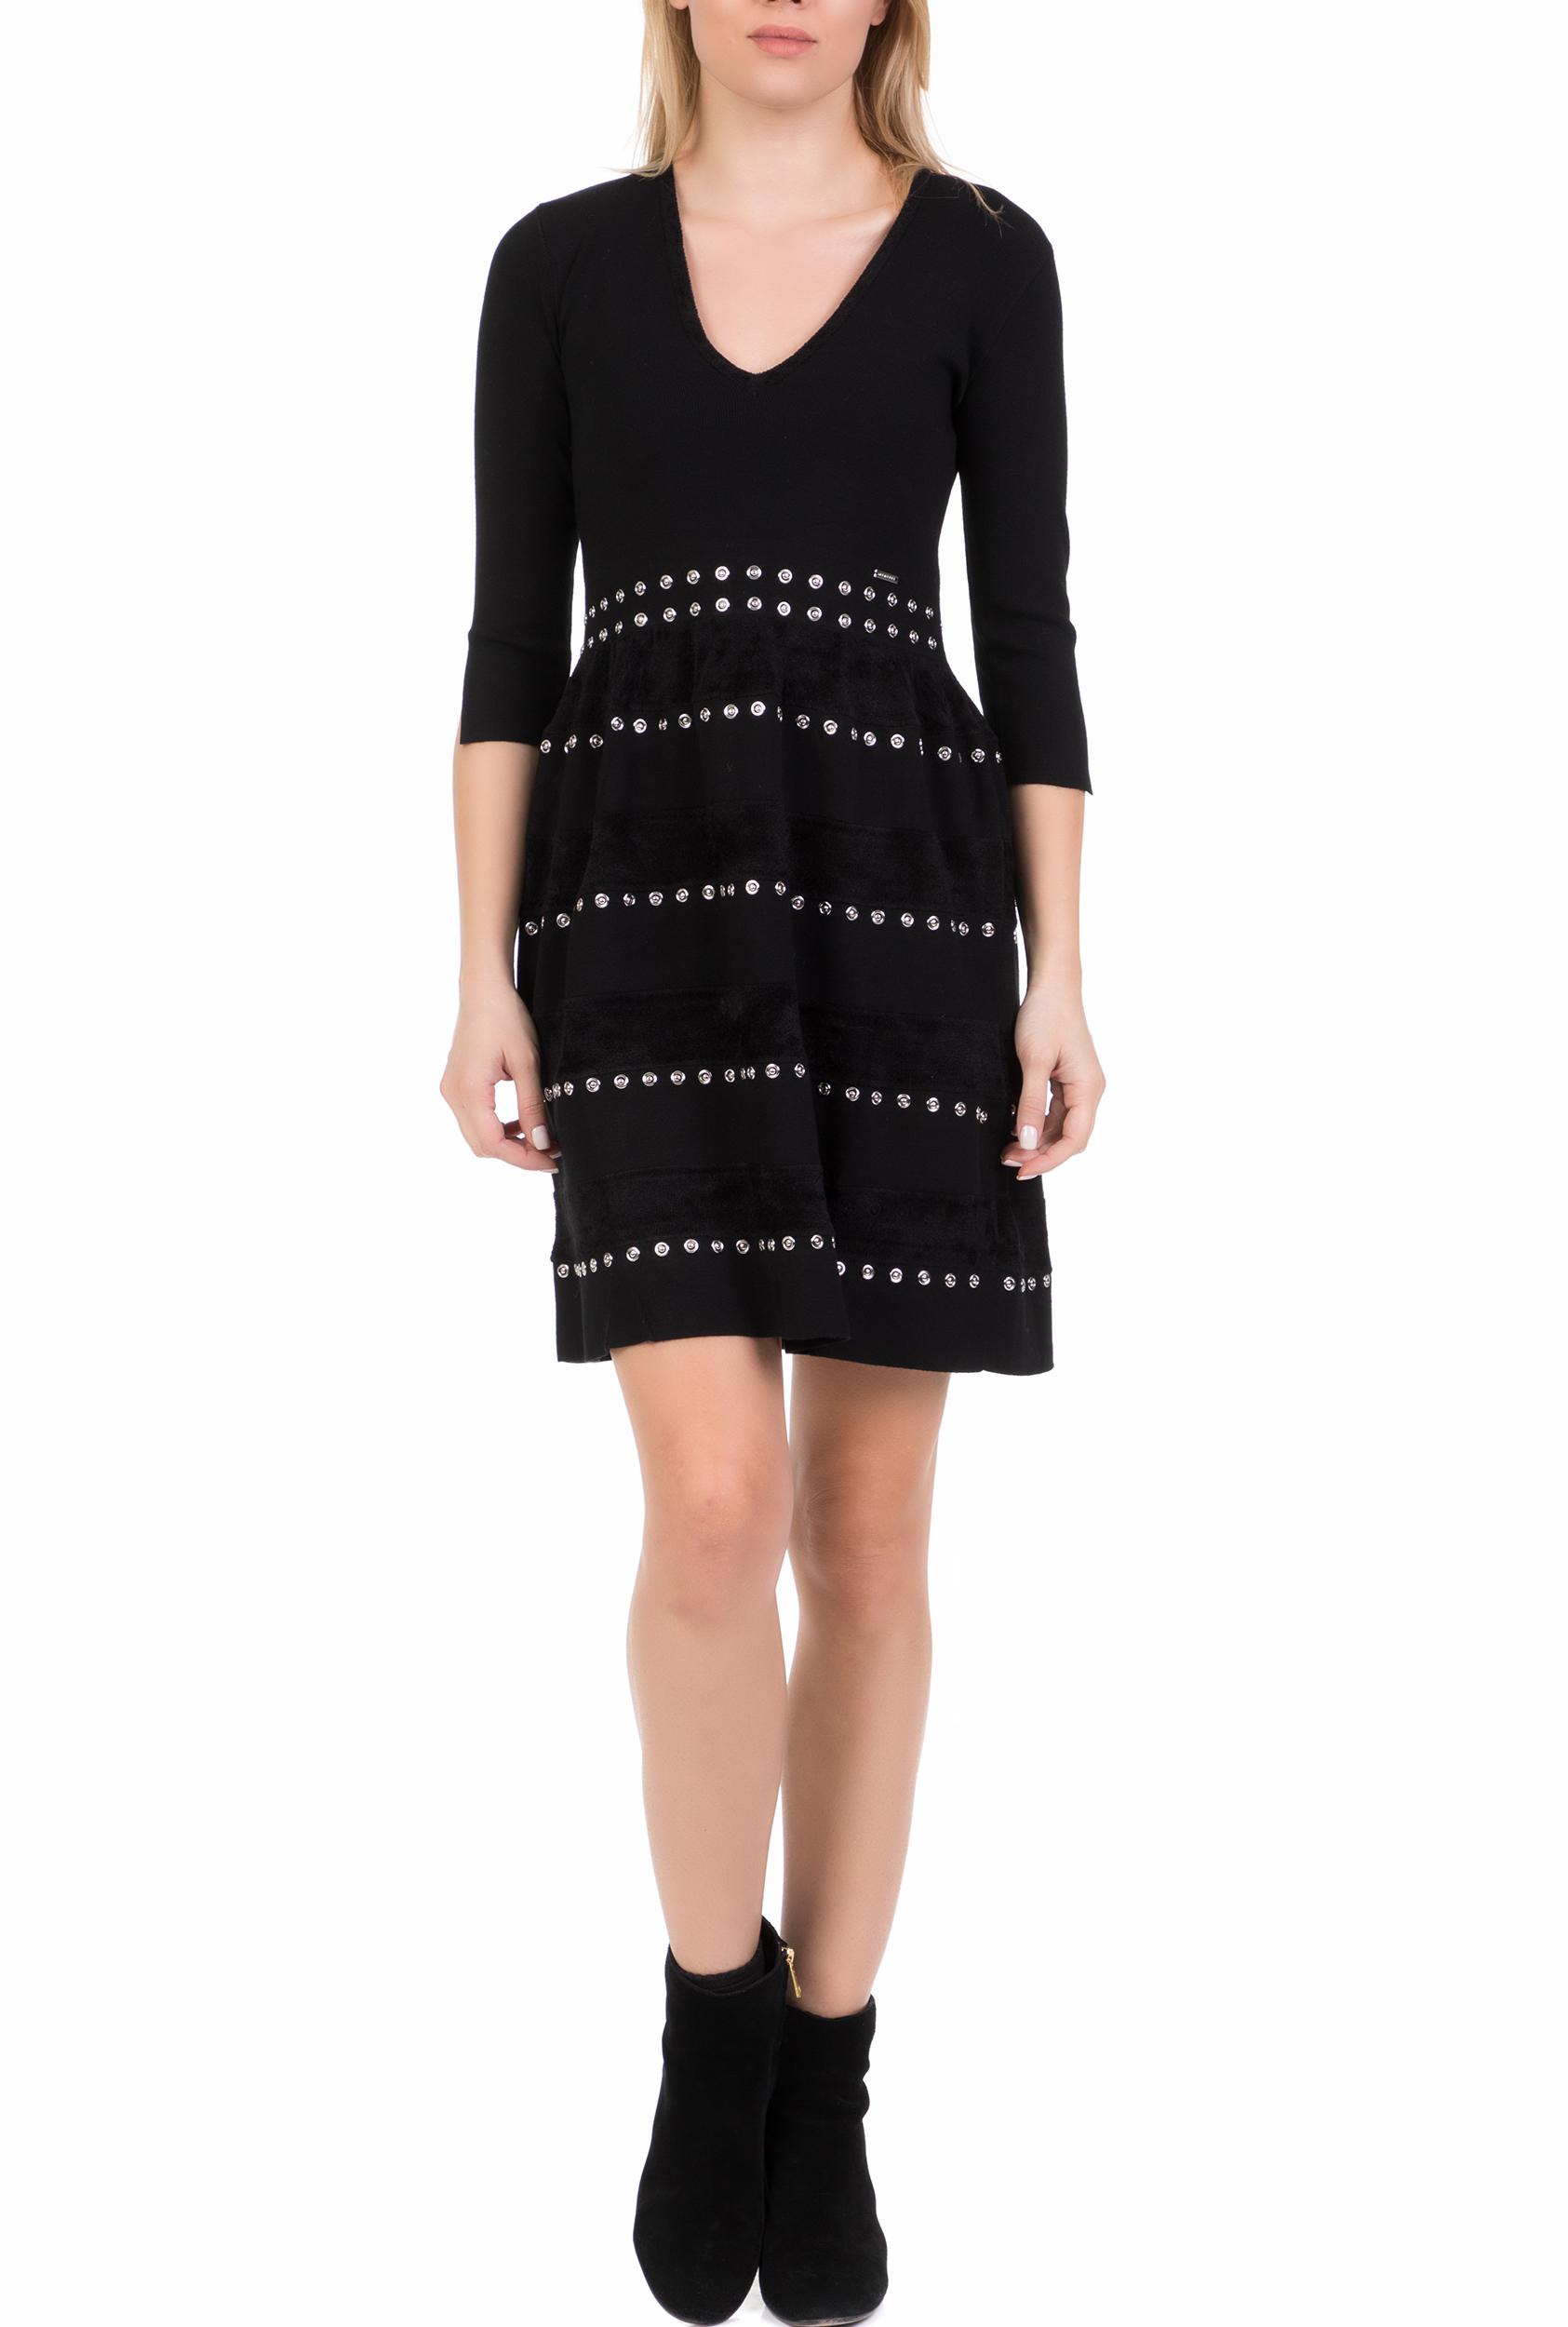 NENETTE - Γυναικείο μίνι φόρεμα NENETTE μαύρο γυναικεία ρούχα φόρεματα μίνι